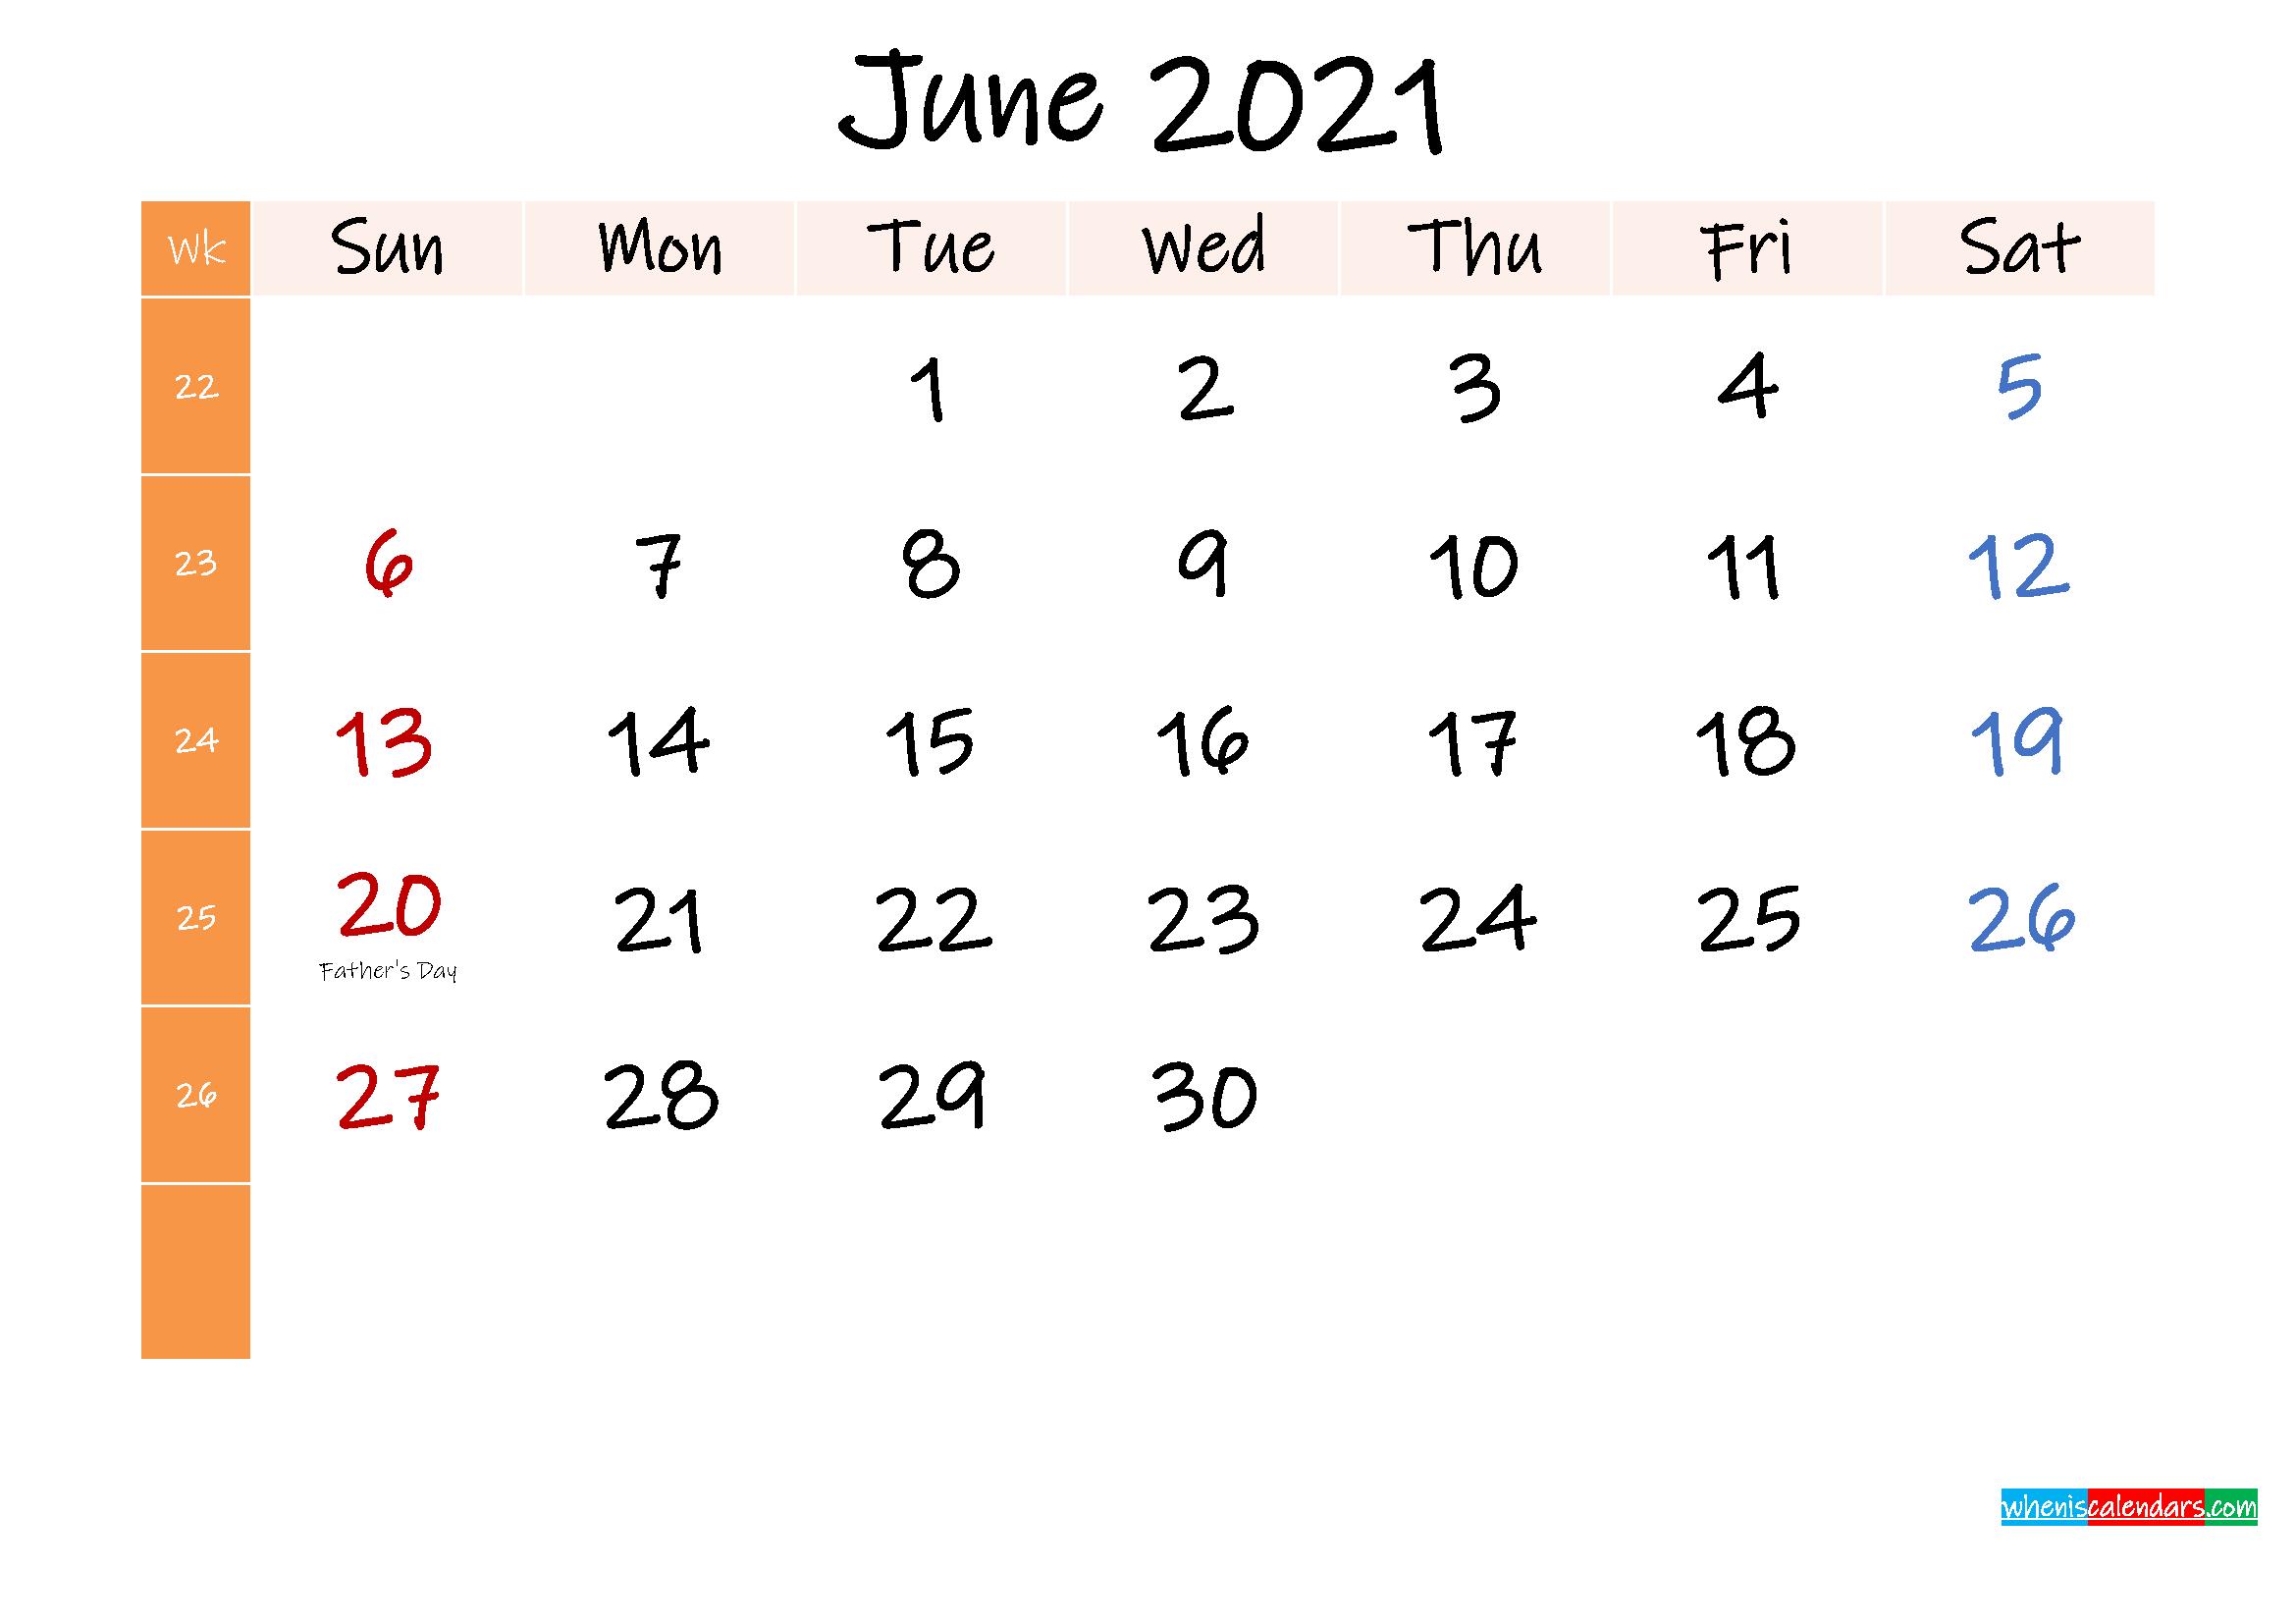 Free June 2021 Monthly Calendar Template Word